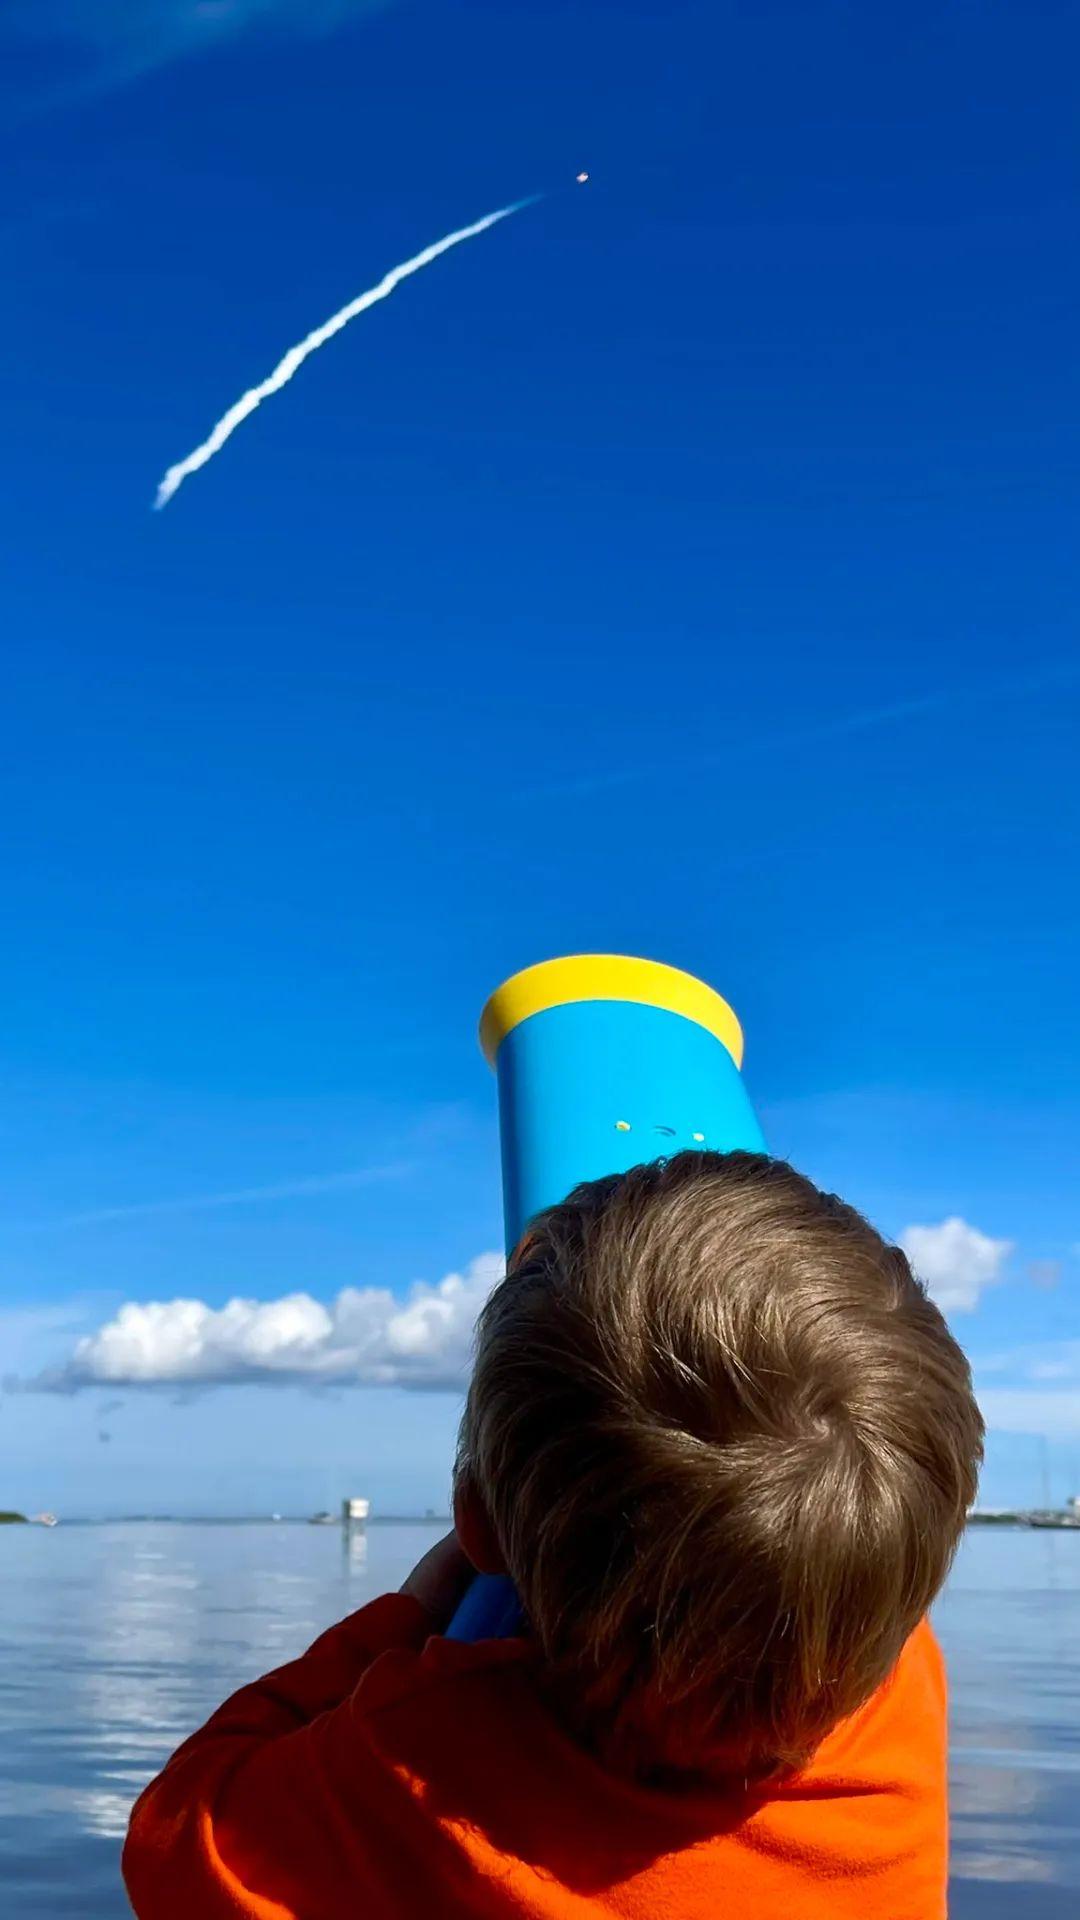 SpaceX动用七手火箭、二手整流罩首次用于客户任务